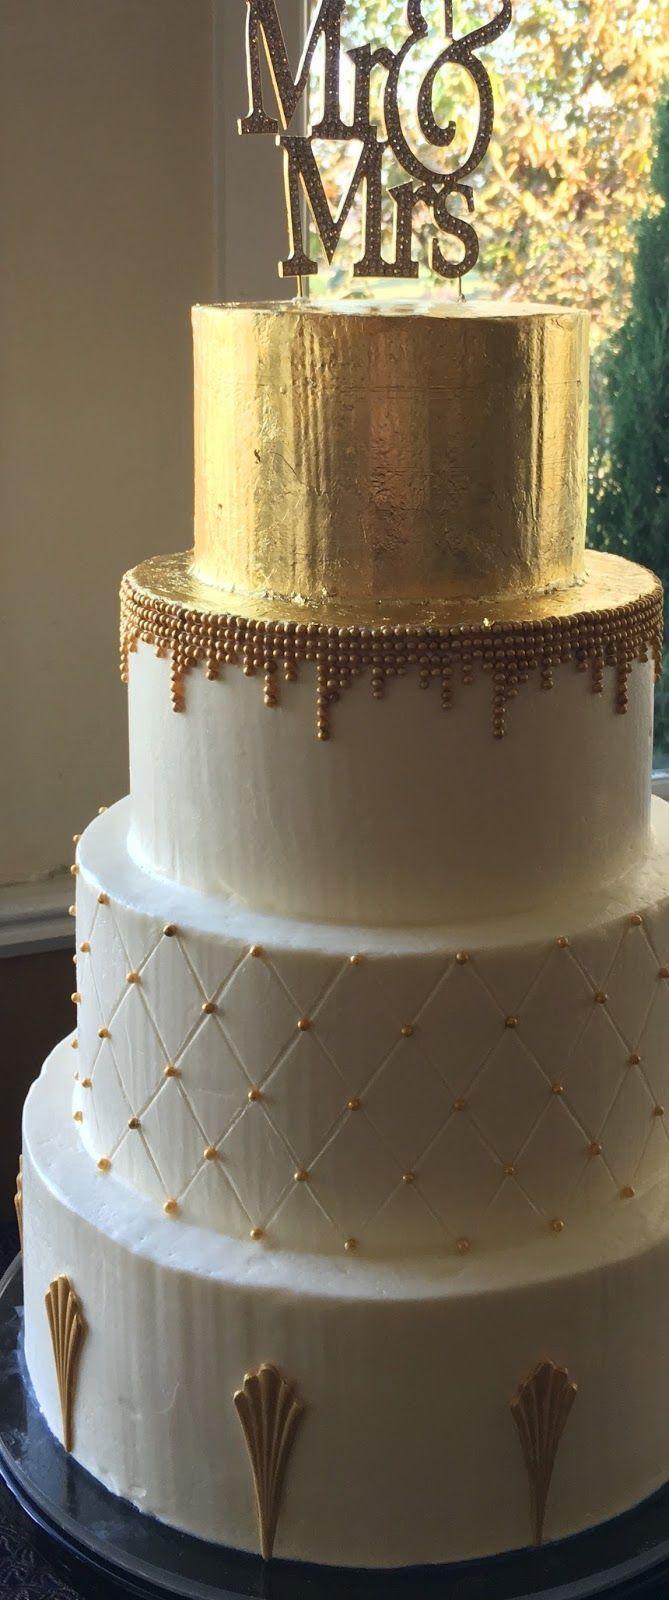 1920s wedding decoration ideas  Art Deco Wedding Cake As a Buttercream Wedding Cake baker I get